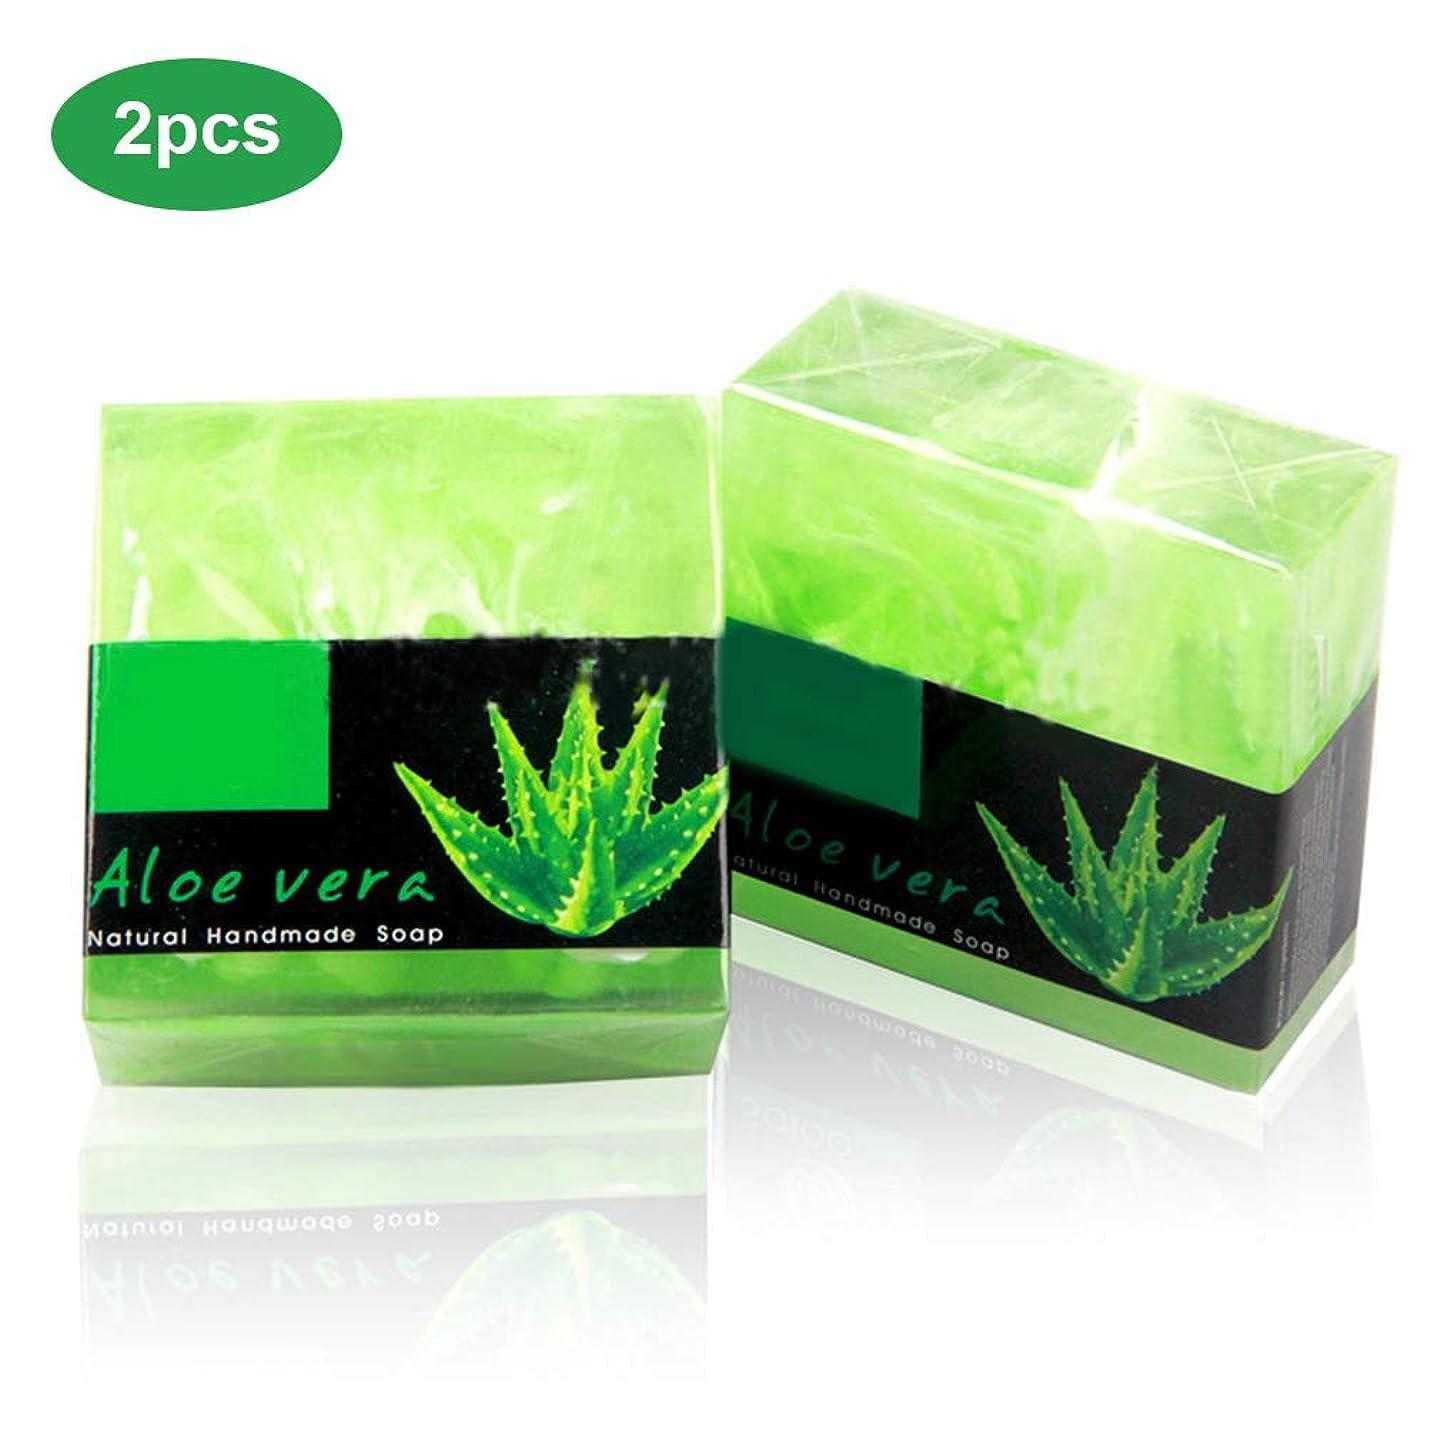 Creacom アロエ 石鹸 肌に優しい無添加 毛穴 対策 洗顔石鹸 保湿 固形 毛穴 肌荒れ 美肌 角質除去 乾燥肌 オイル肌 混合肌 対策 全身可能